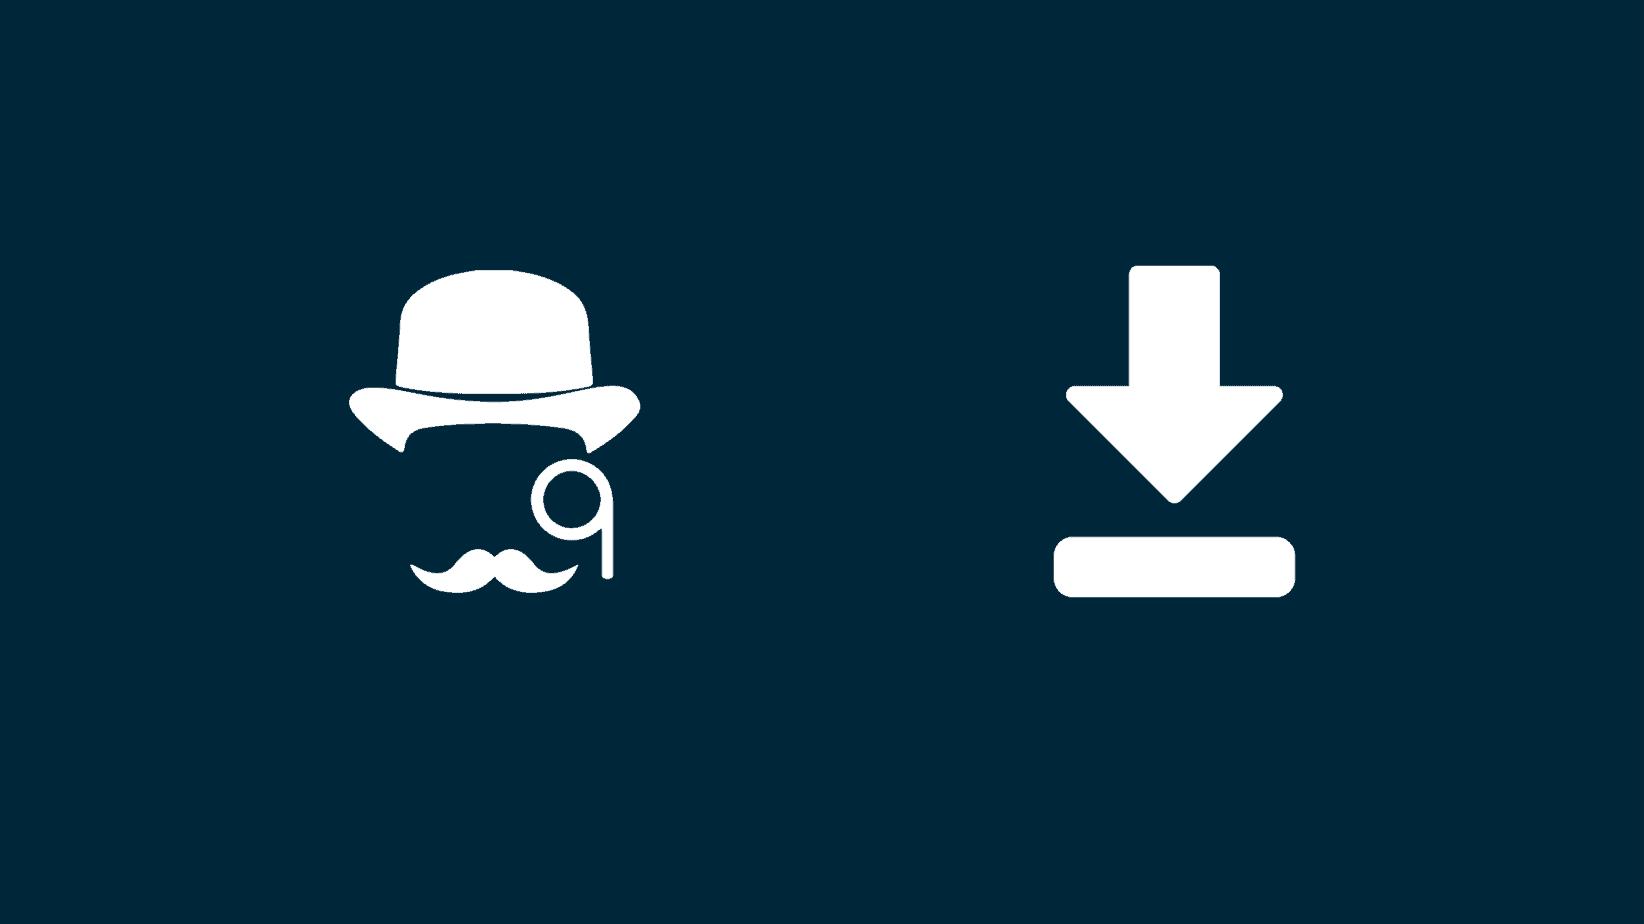 Sherlock download links